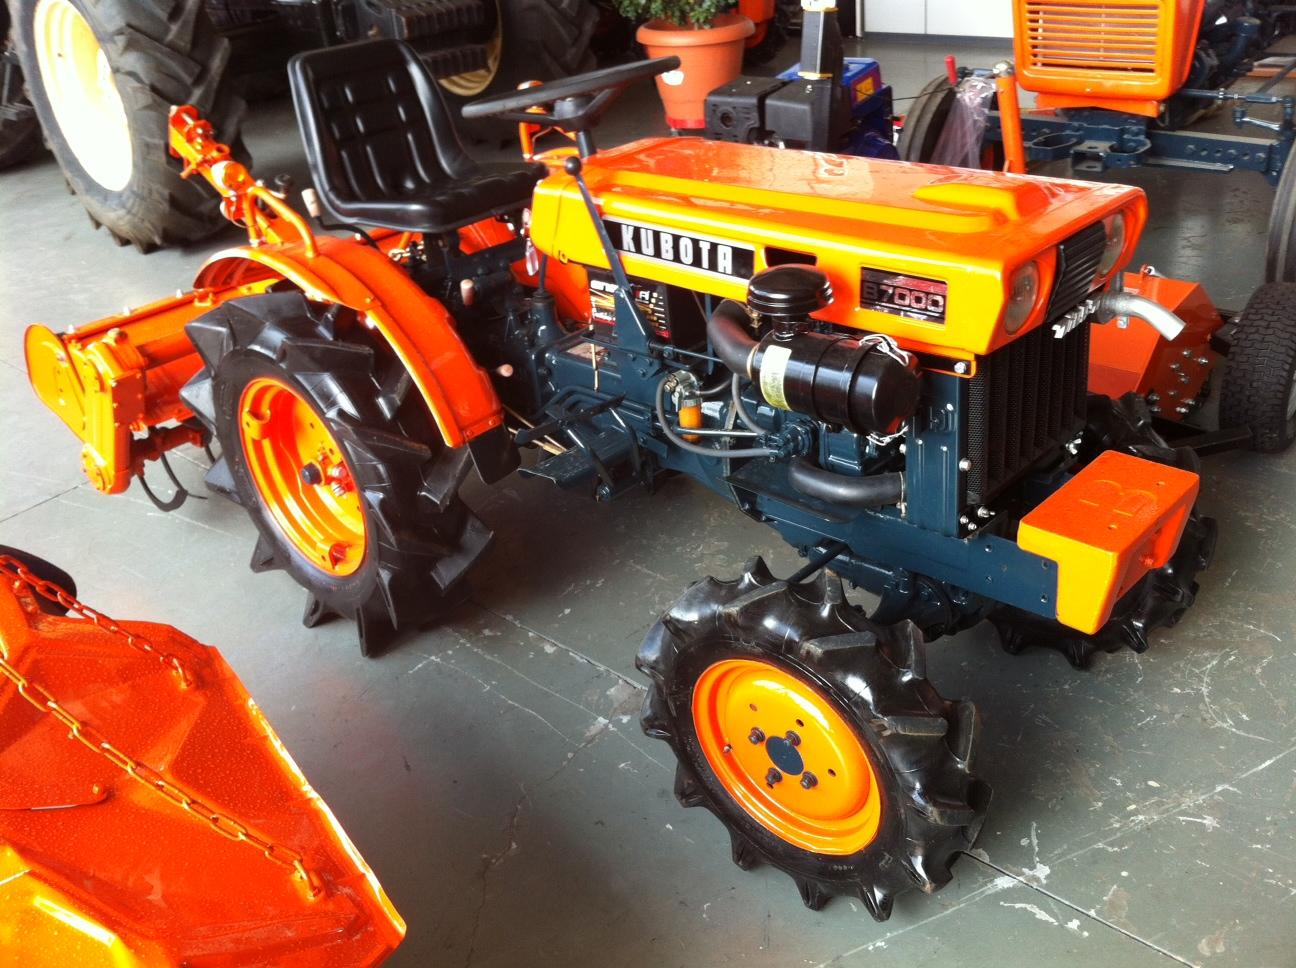 Mini tractor de ocasi n kubota b 7000 dt talleres hijos - Mesillas de segunda mano ...